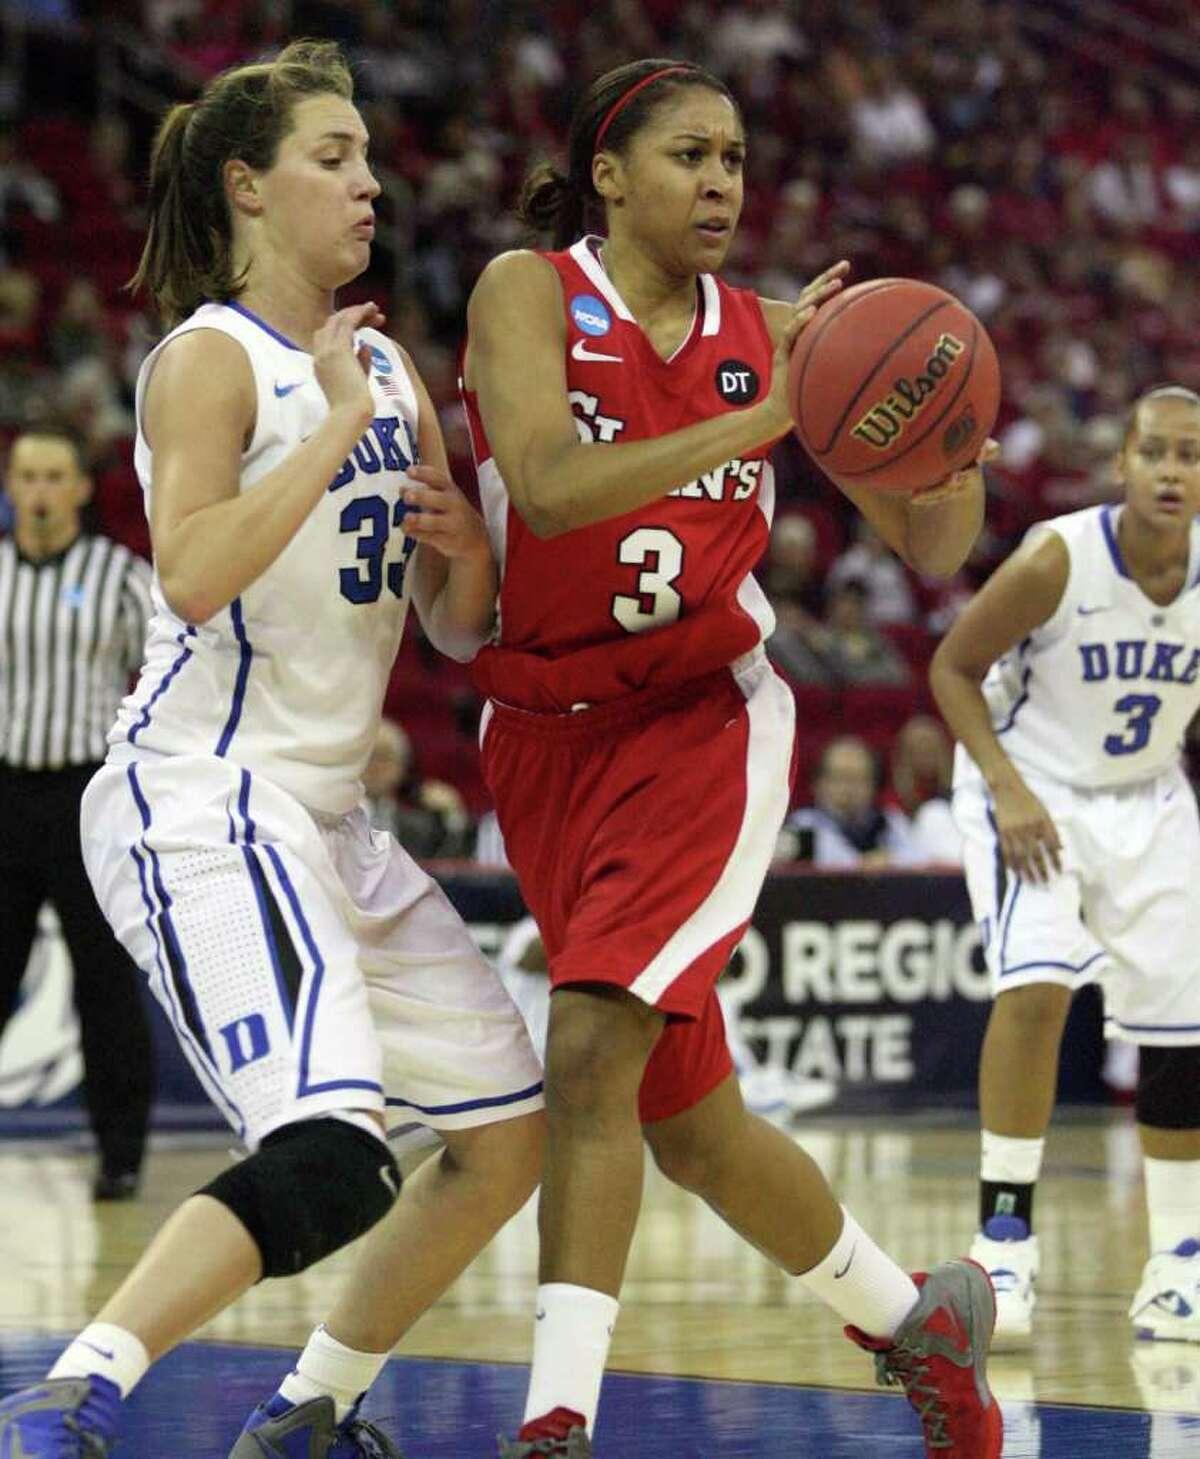 St. John's Da'Shena Stevens passes against Duke's Haley Peters during the first half of an NCAA women's tournament regional semifinal college basketball game Saturday, March 24, Fresno, Calif. (AP Photo/Gary Kazanjian)